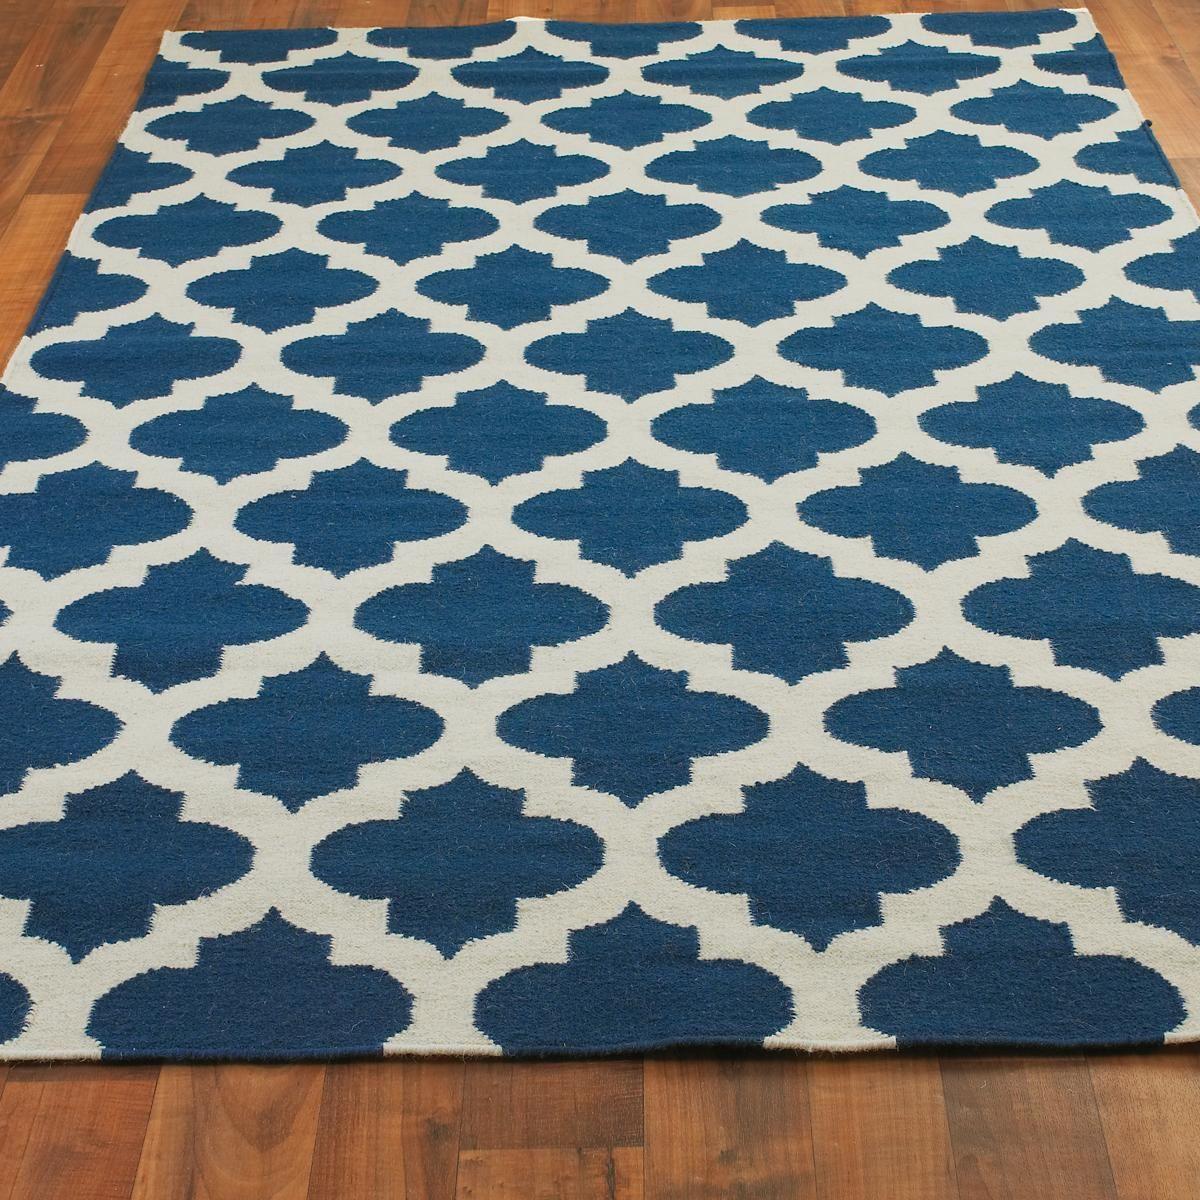 Ironwork Trellis Dhurrie Rug | Dhurrie rugs, Lights and Living rooms